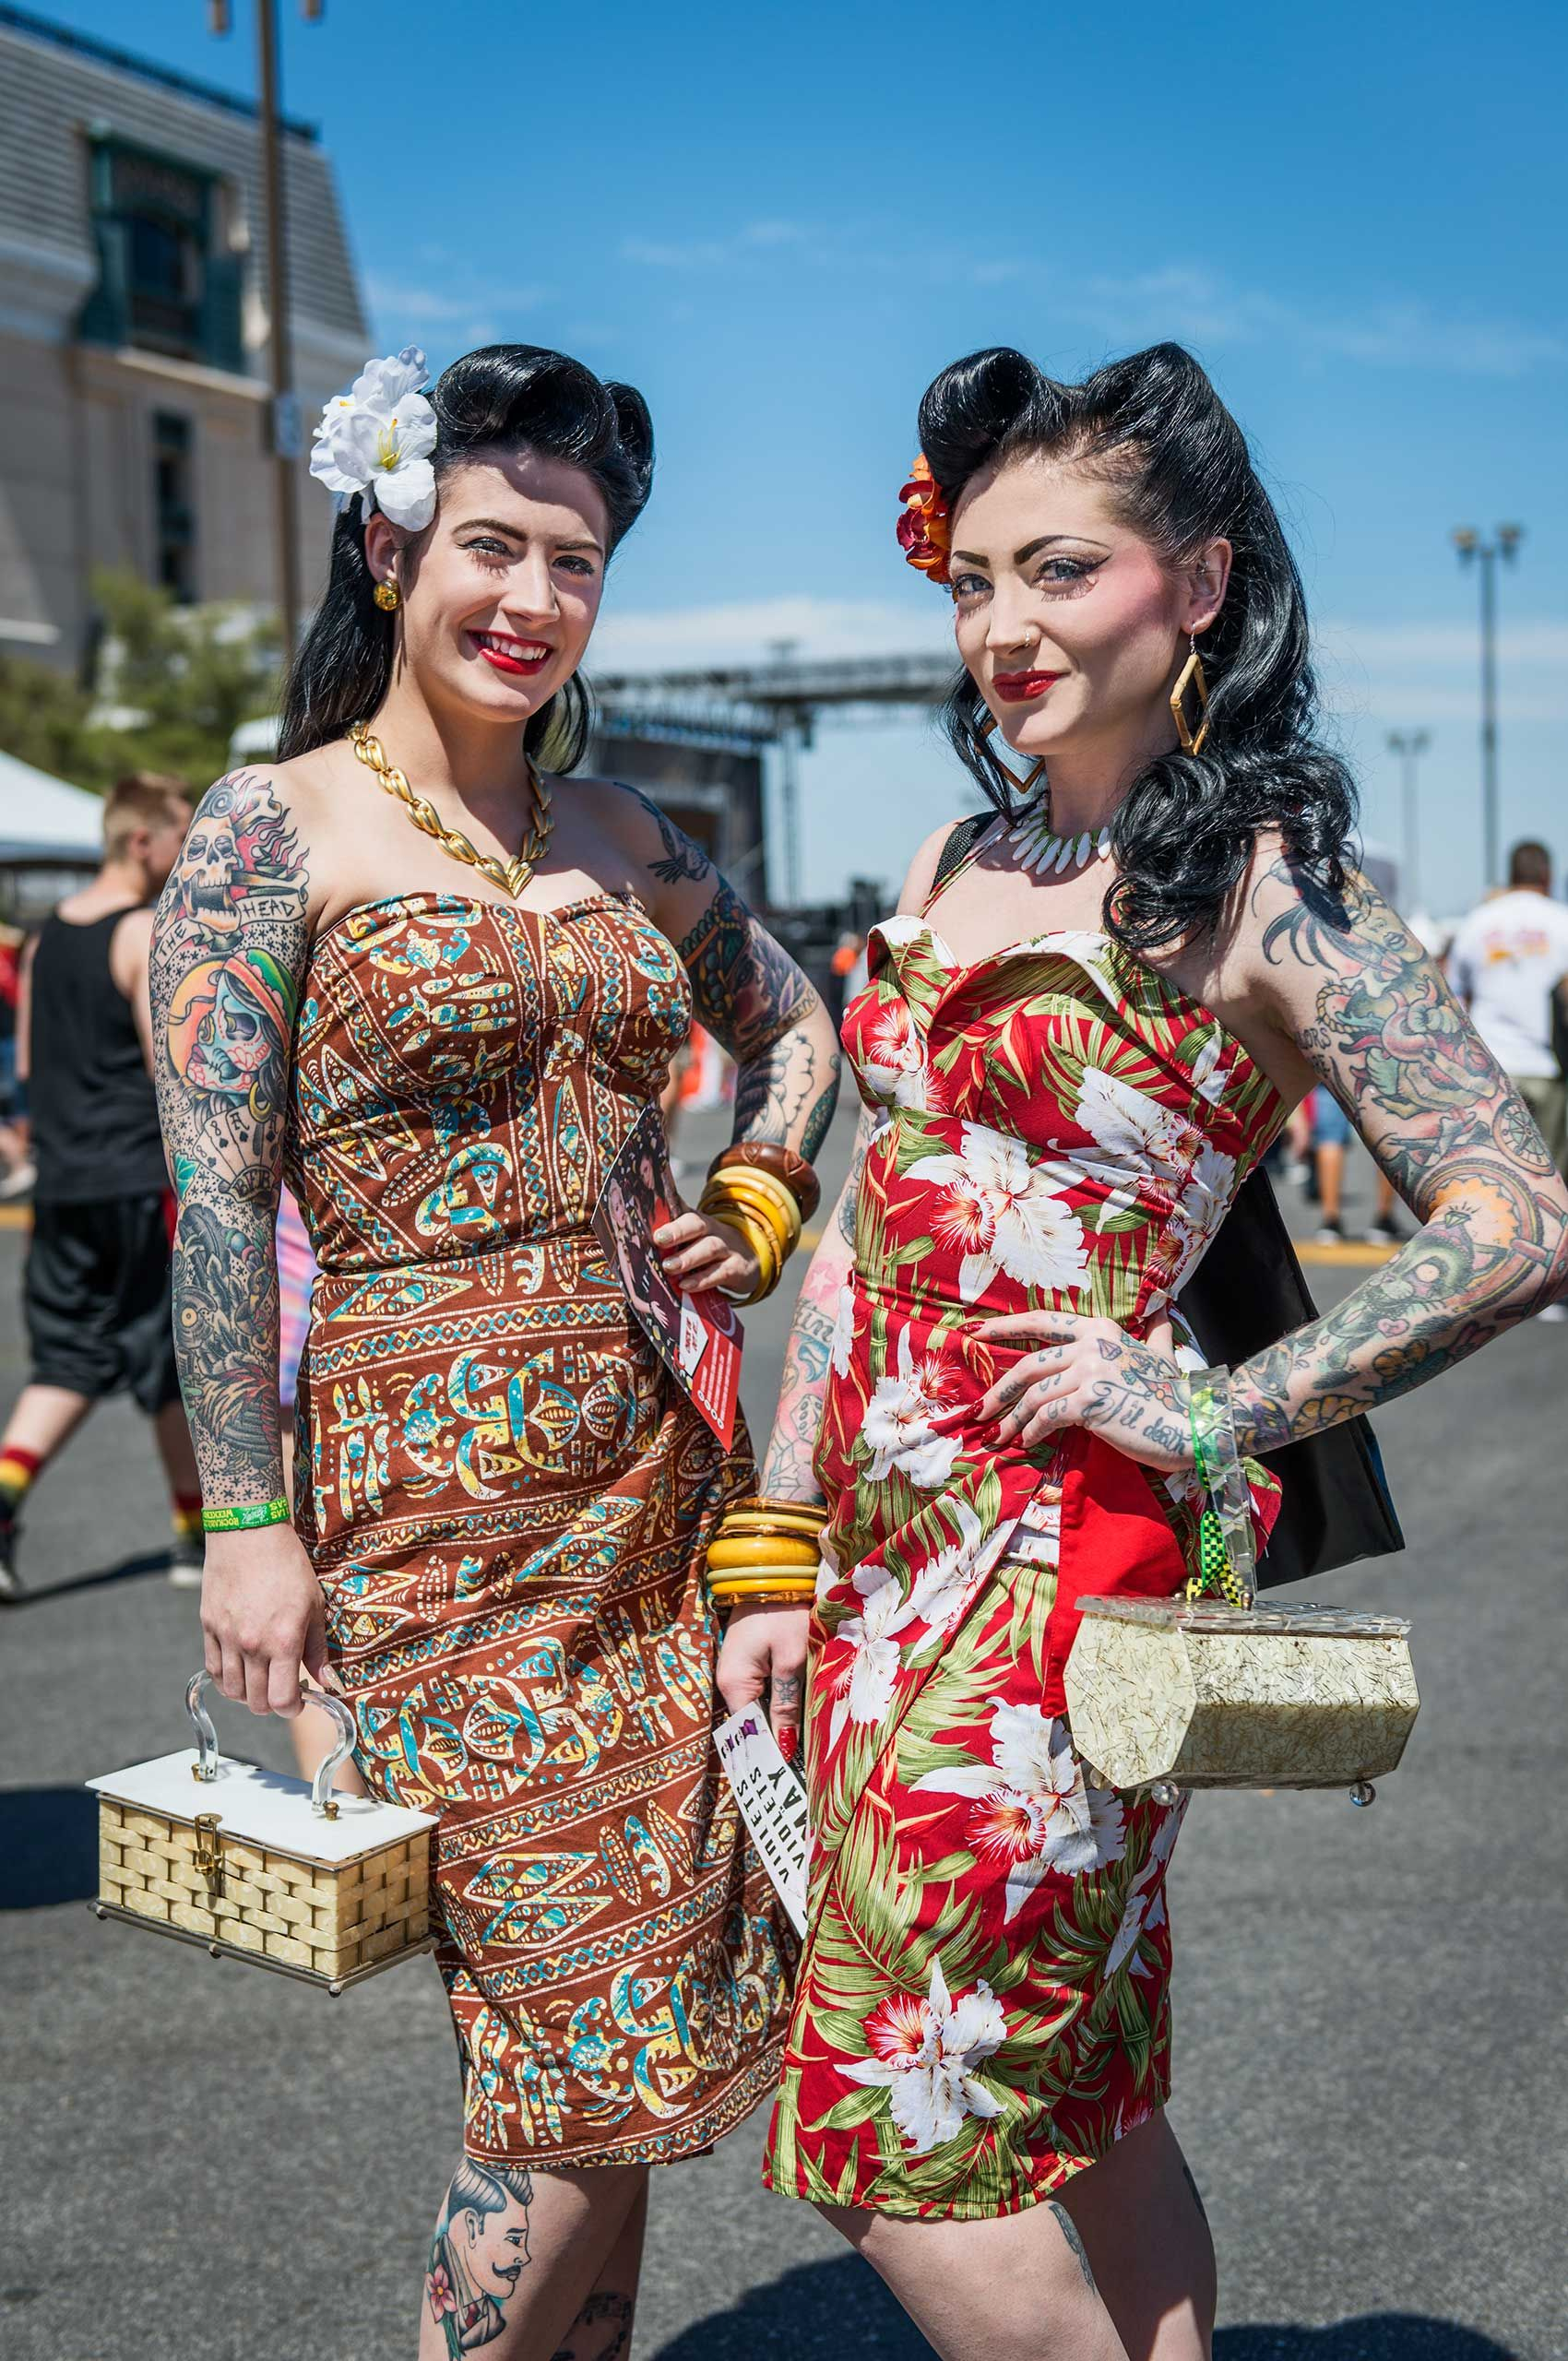 beautiful-girls-vivalasvegas-HenrikOlundPhotography.jpg